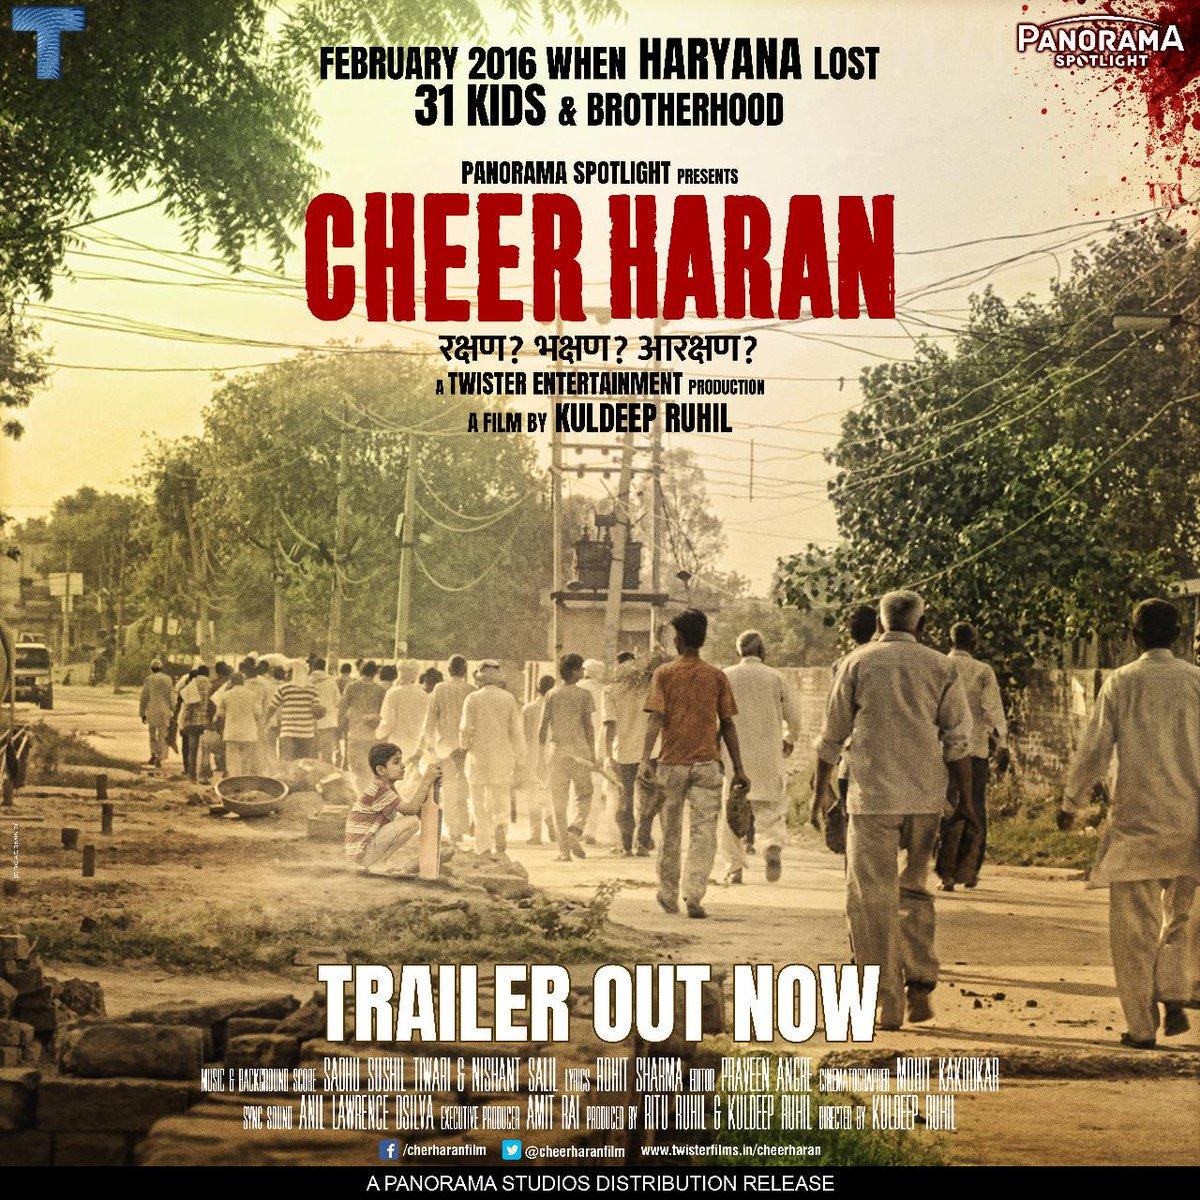 Here's a glimpse of the reality of #JatReservationAndolan. The trailer of #CheerHaran out now.  Watch the trailer now:   @KuldeepSRuhil #RituRuhil @KumarMangat @AbhishekPathakk @murli_sonu @rajat_goswami15 @shahdarshanm @Panorama_SL #CheerHaran